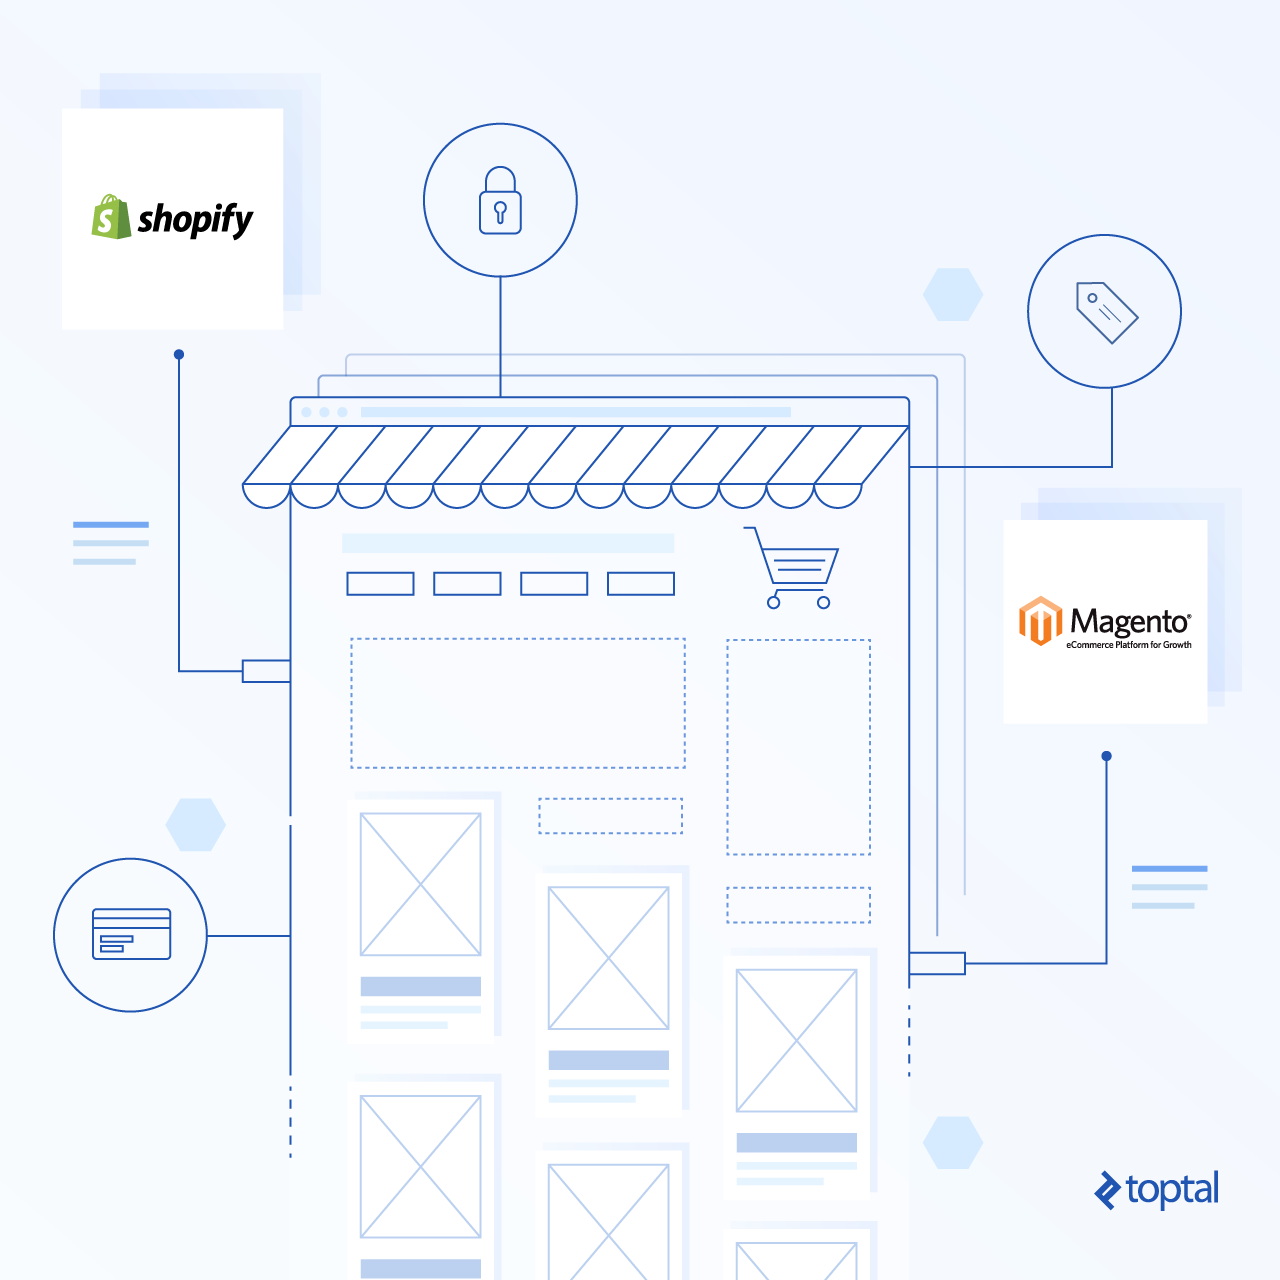 eCommerce Website Development Services | Toptal®